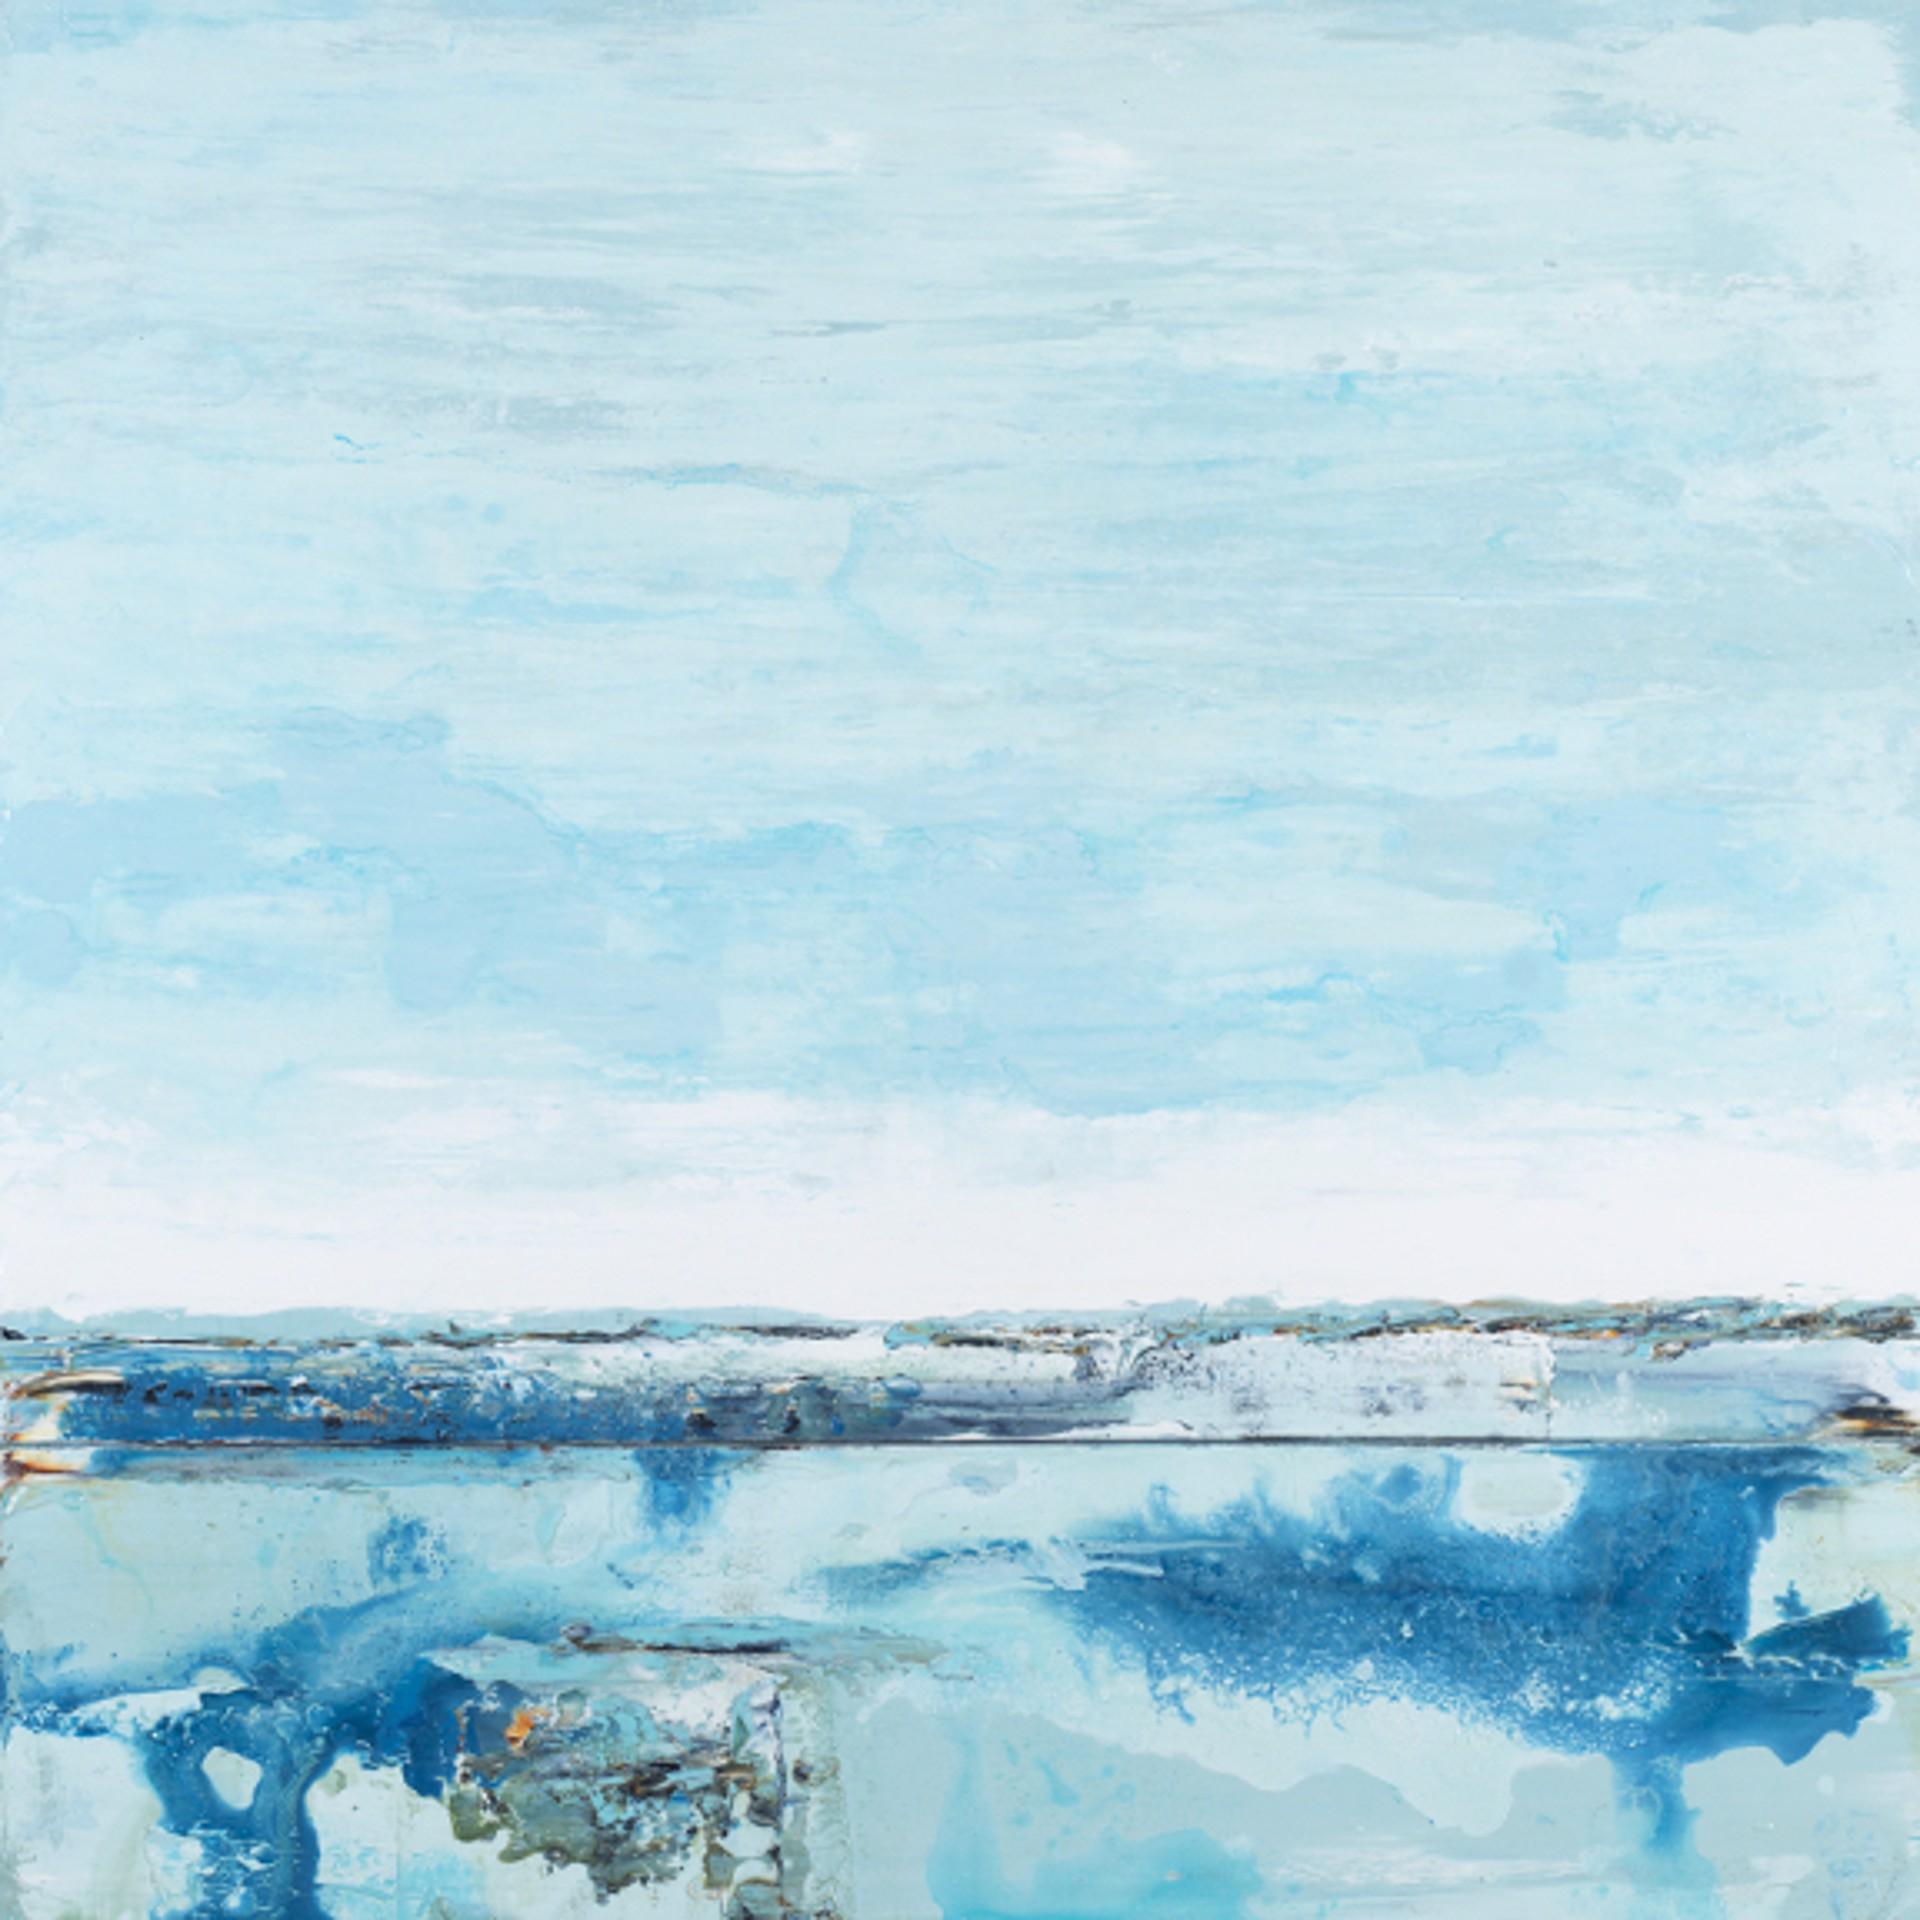 Eterno 48 by John Schuyler